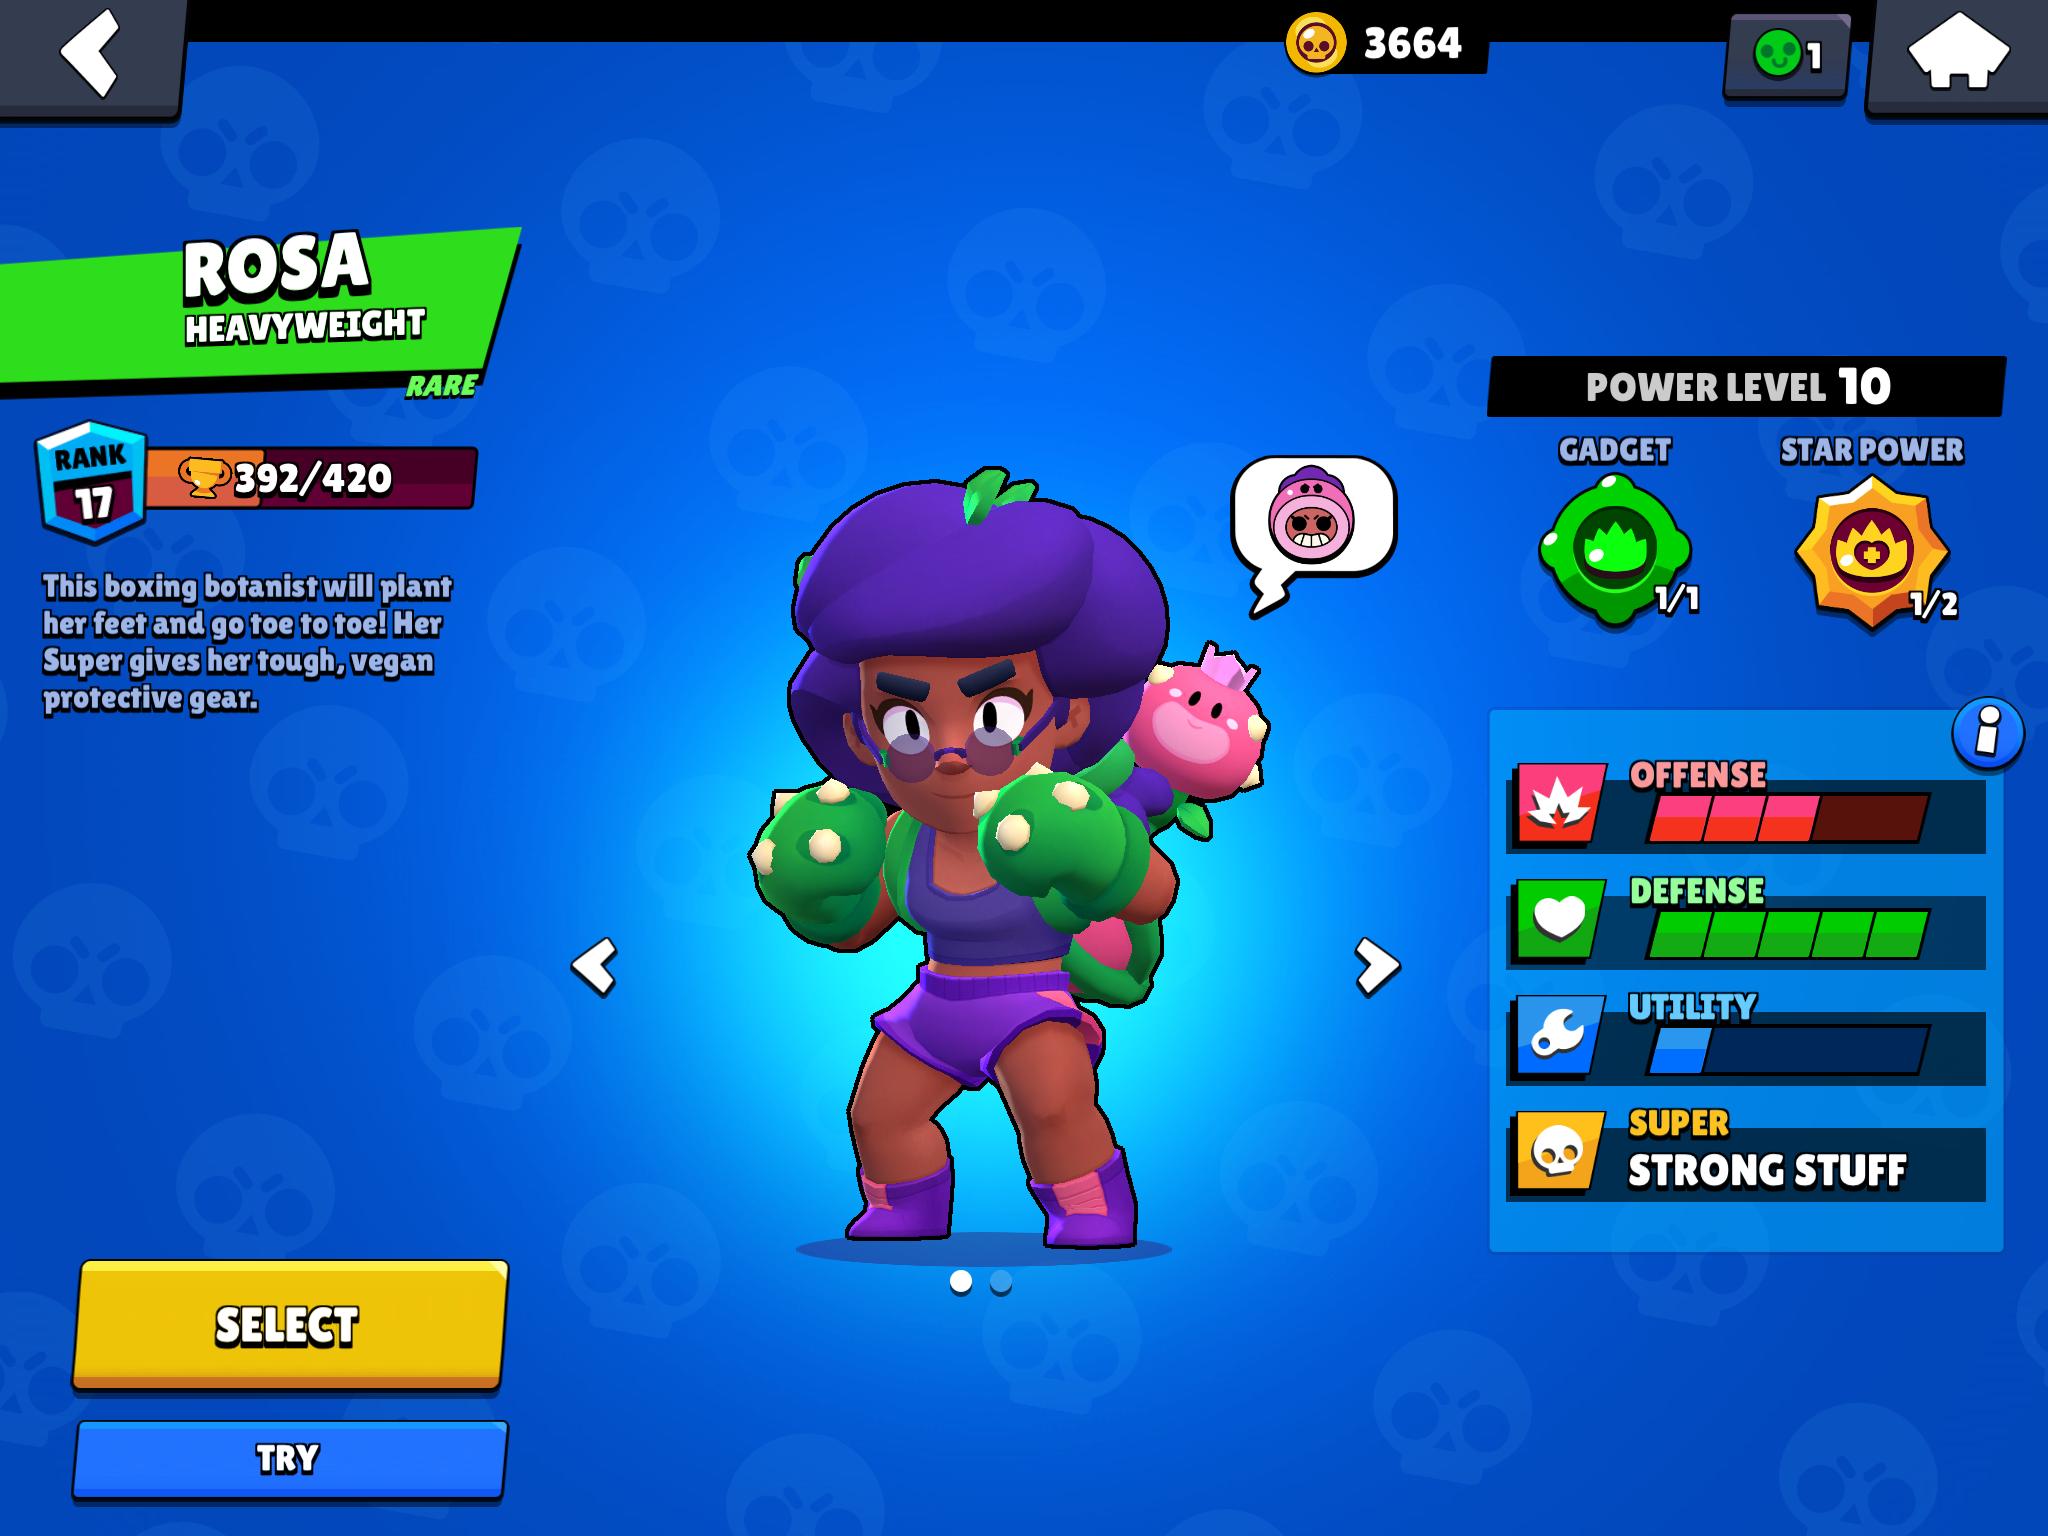 Rosa (New).png